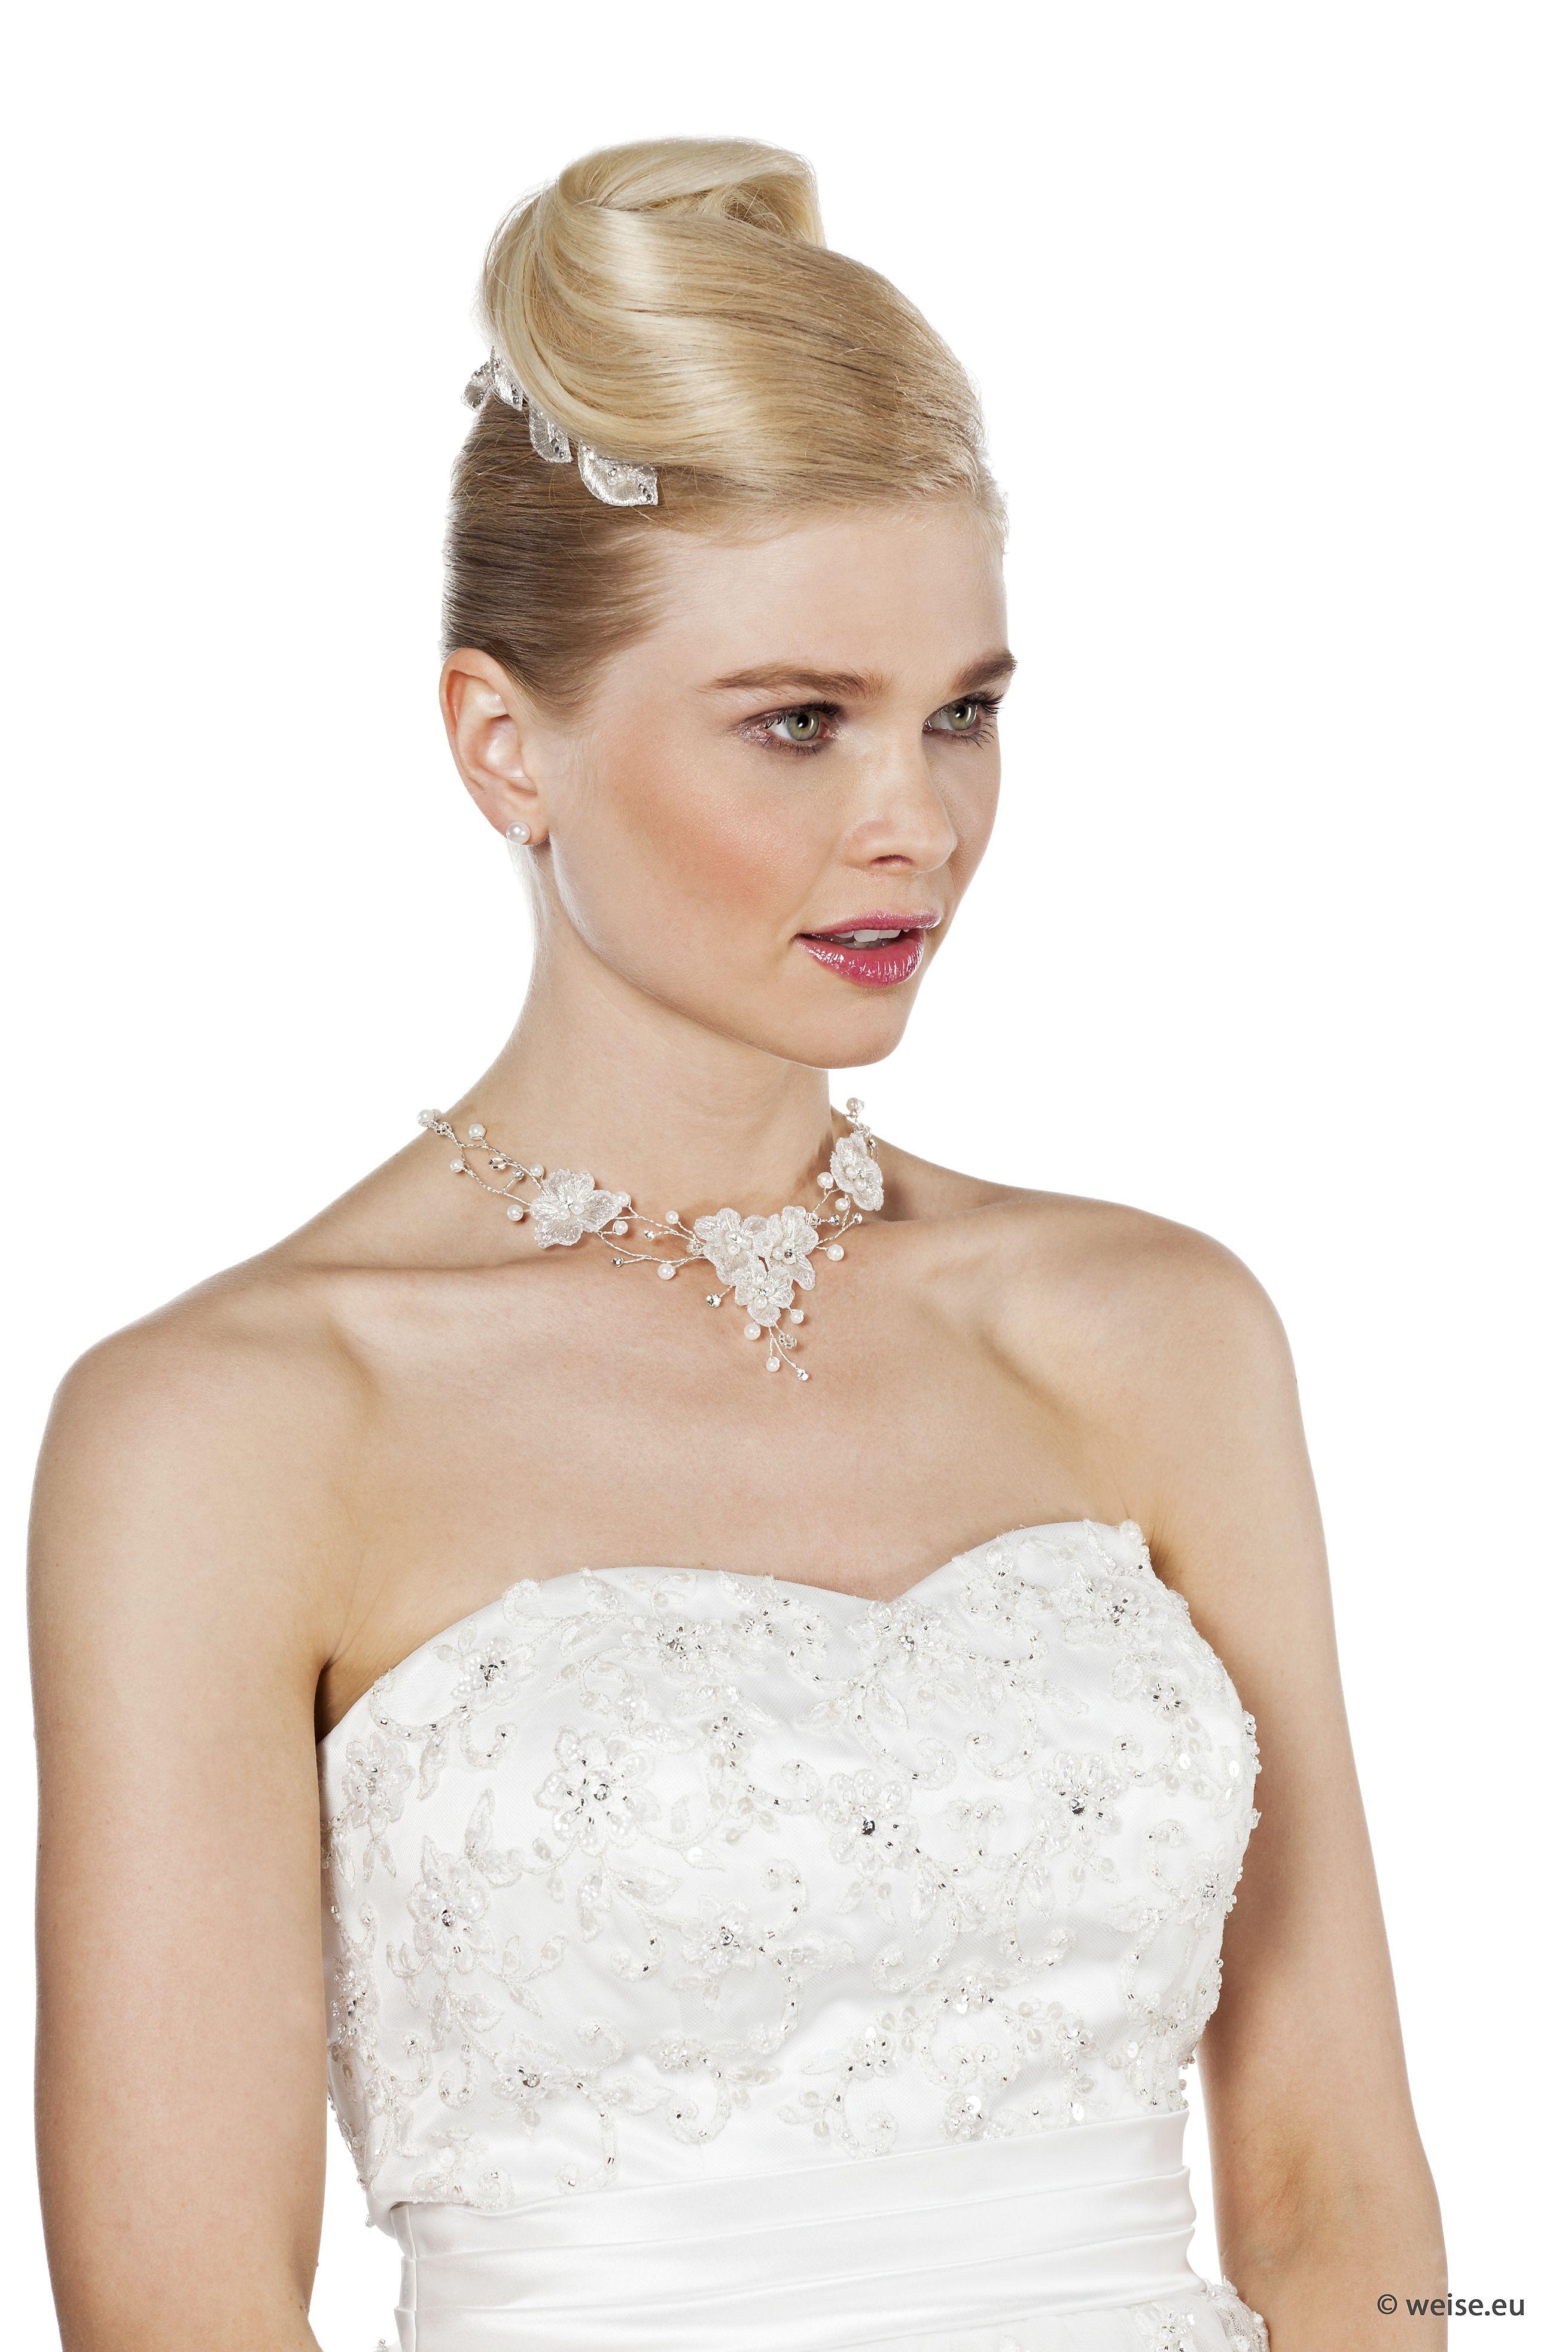 Brautfrisur gesteckt make up jewellery u hair plus alot more